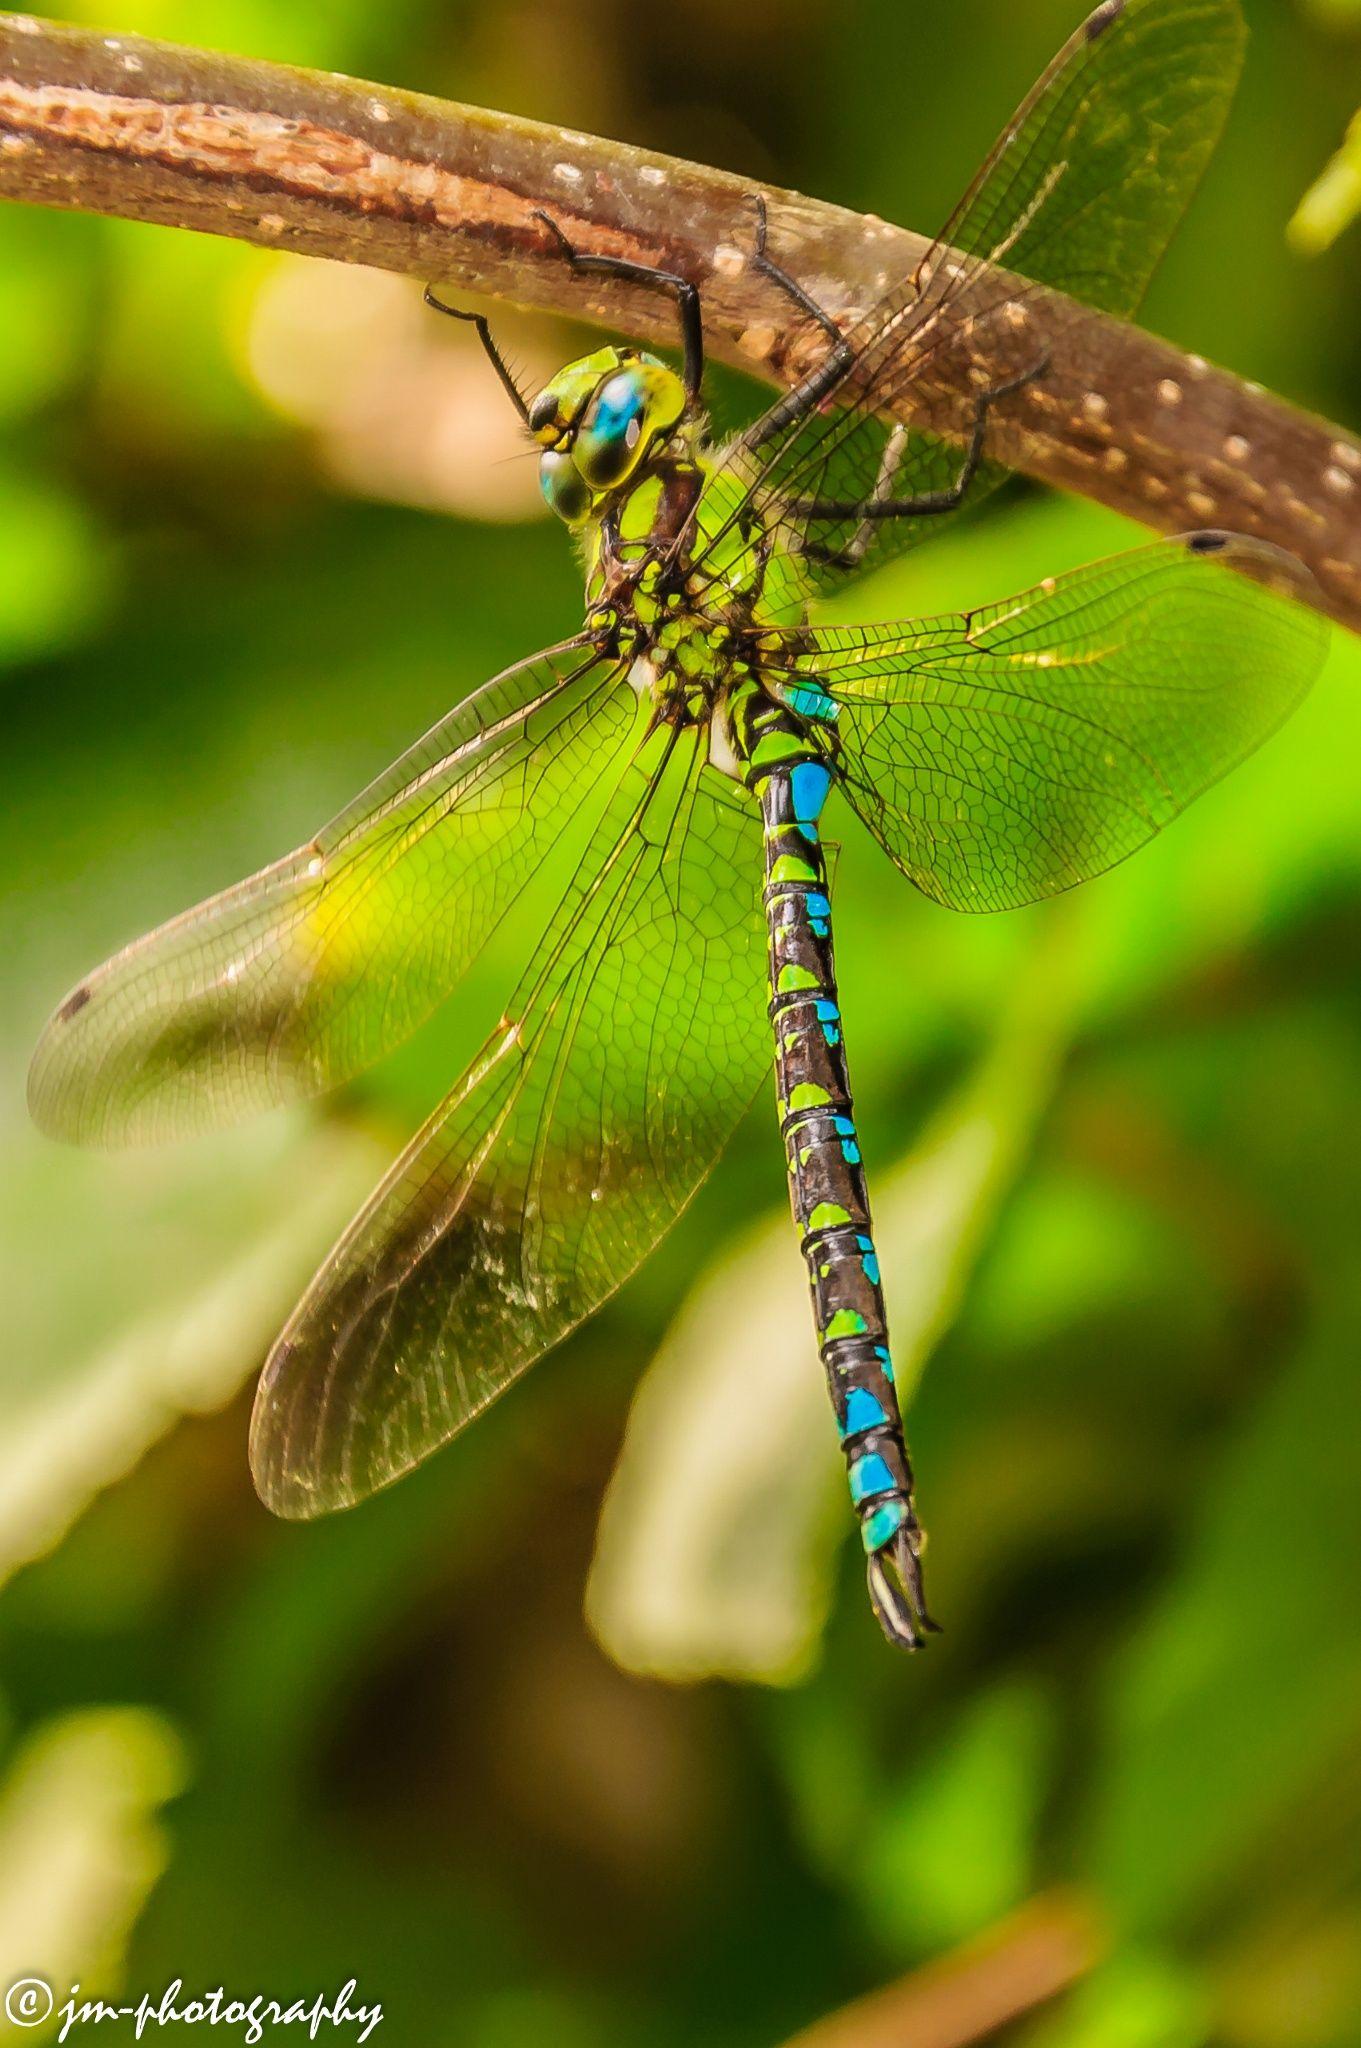 Dragonfly トンボ 虫 蜻蜓